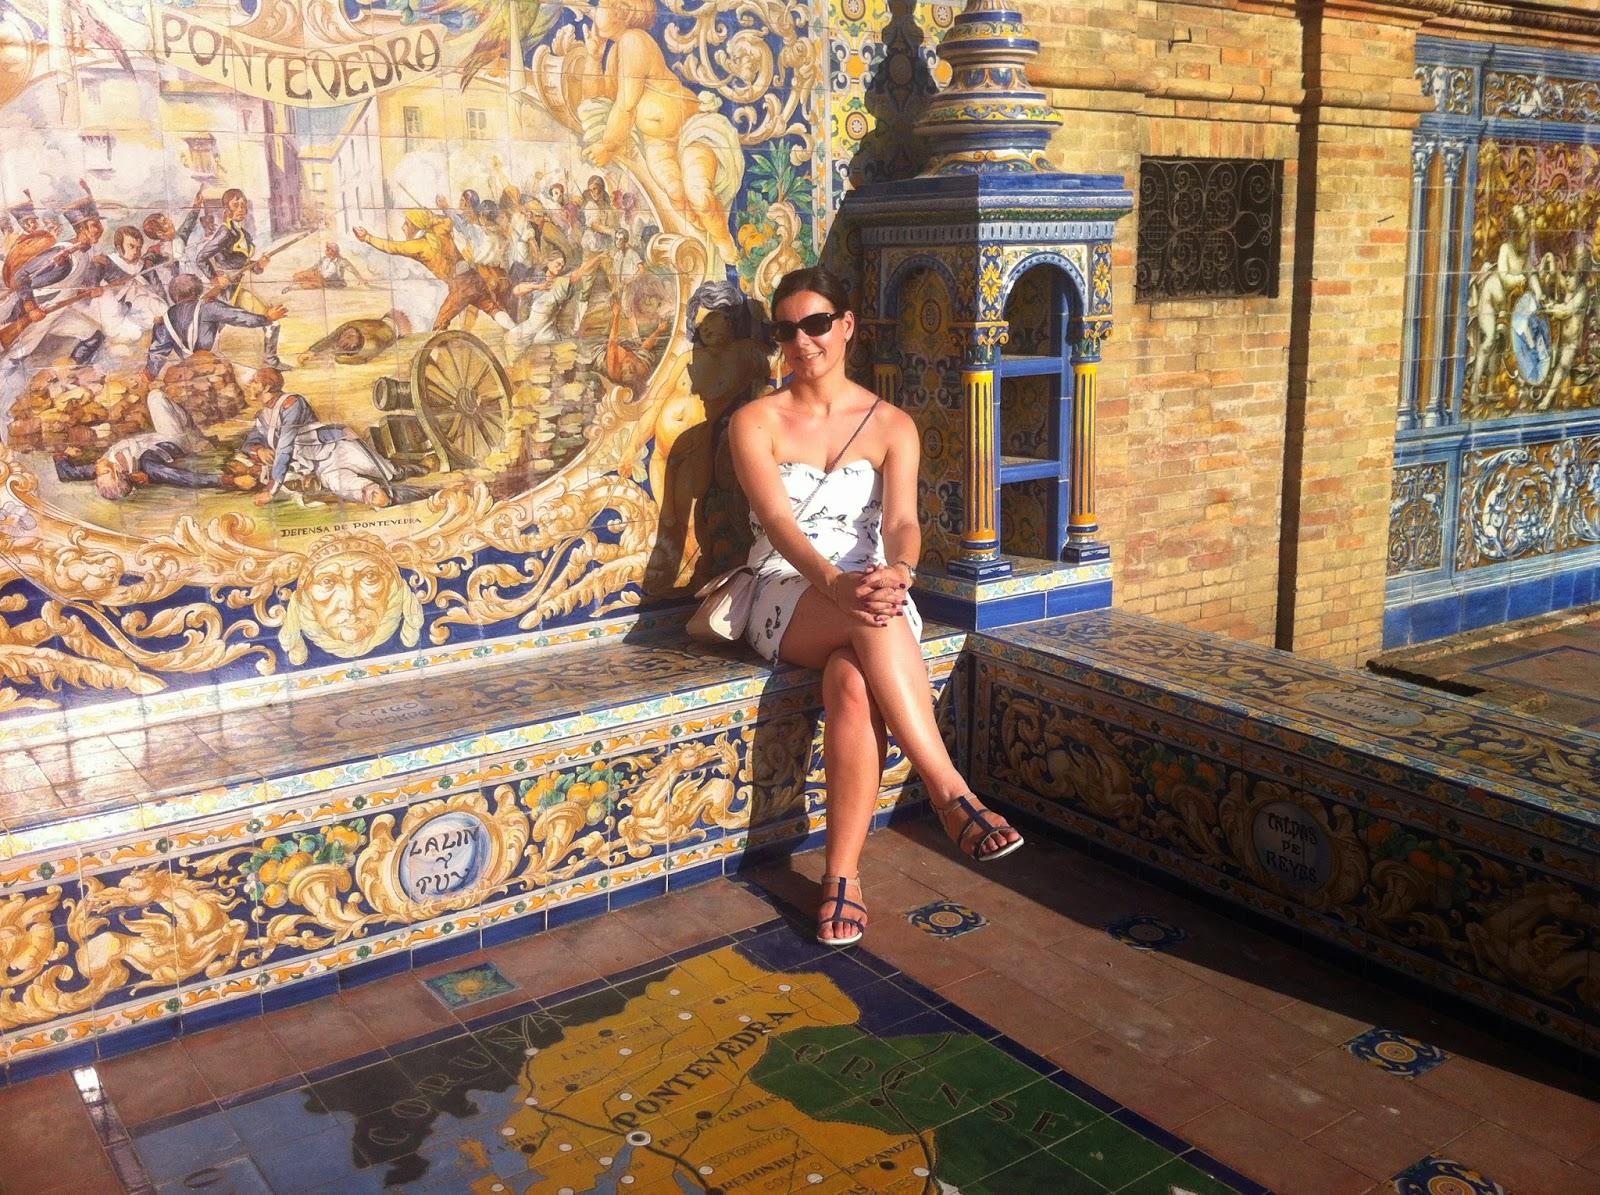 robe à lunettes Naf Naf, Séville Plaza de Espagna